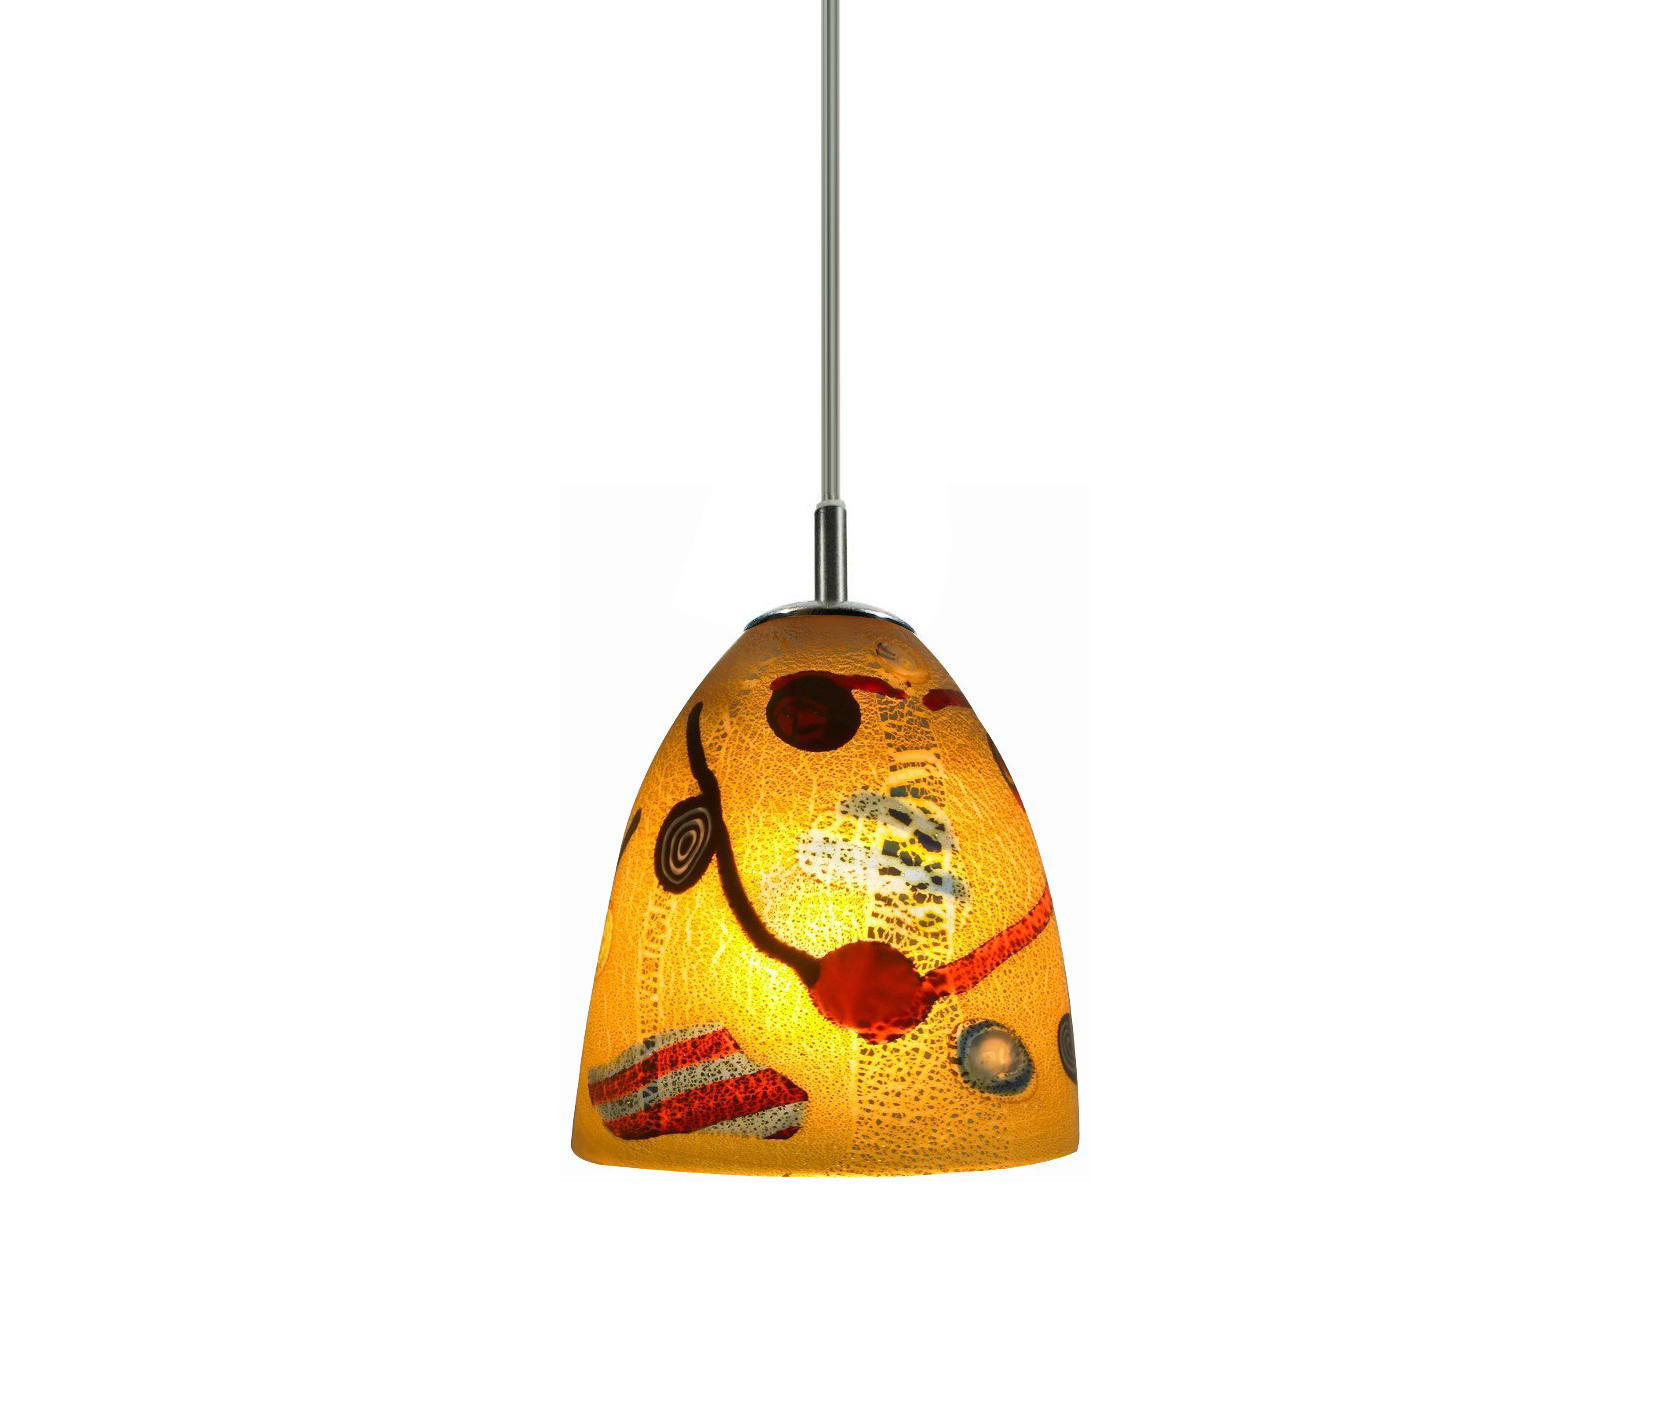 Kandinsky pendant gold general lighting from oggetti architonic kandinsky pendant gold by oggetti general lighting aloadofball Choice Image